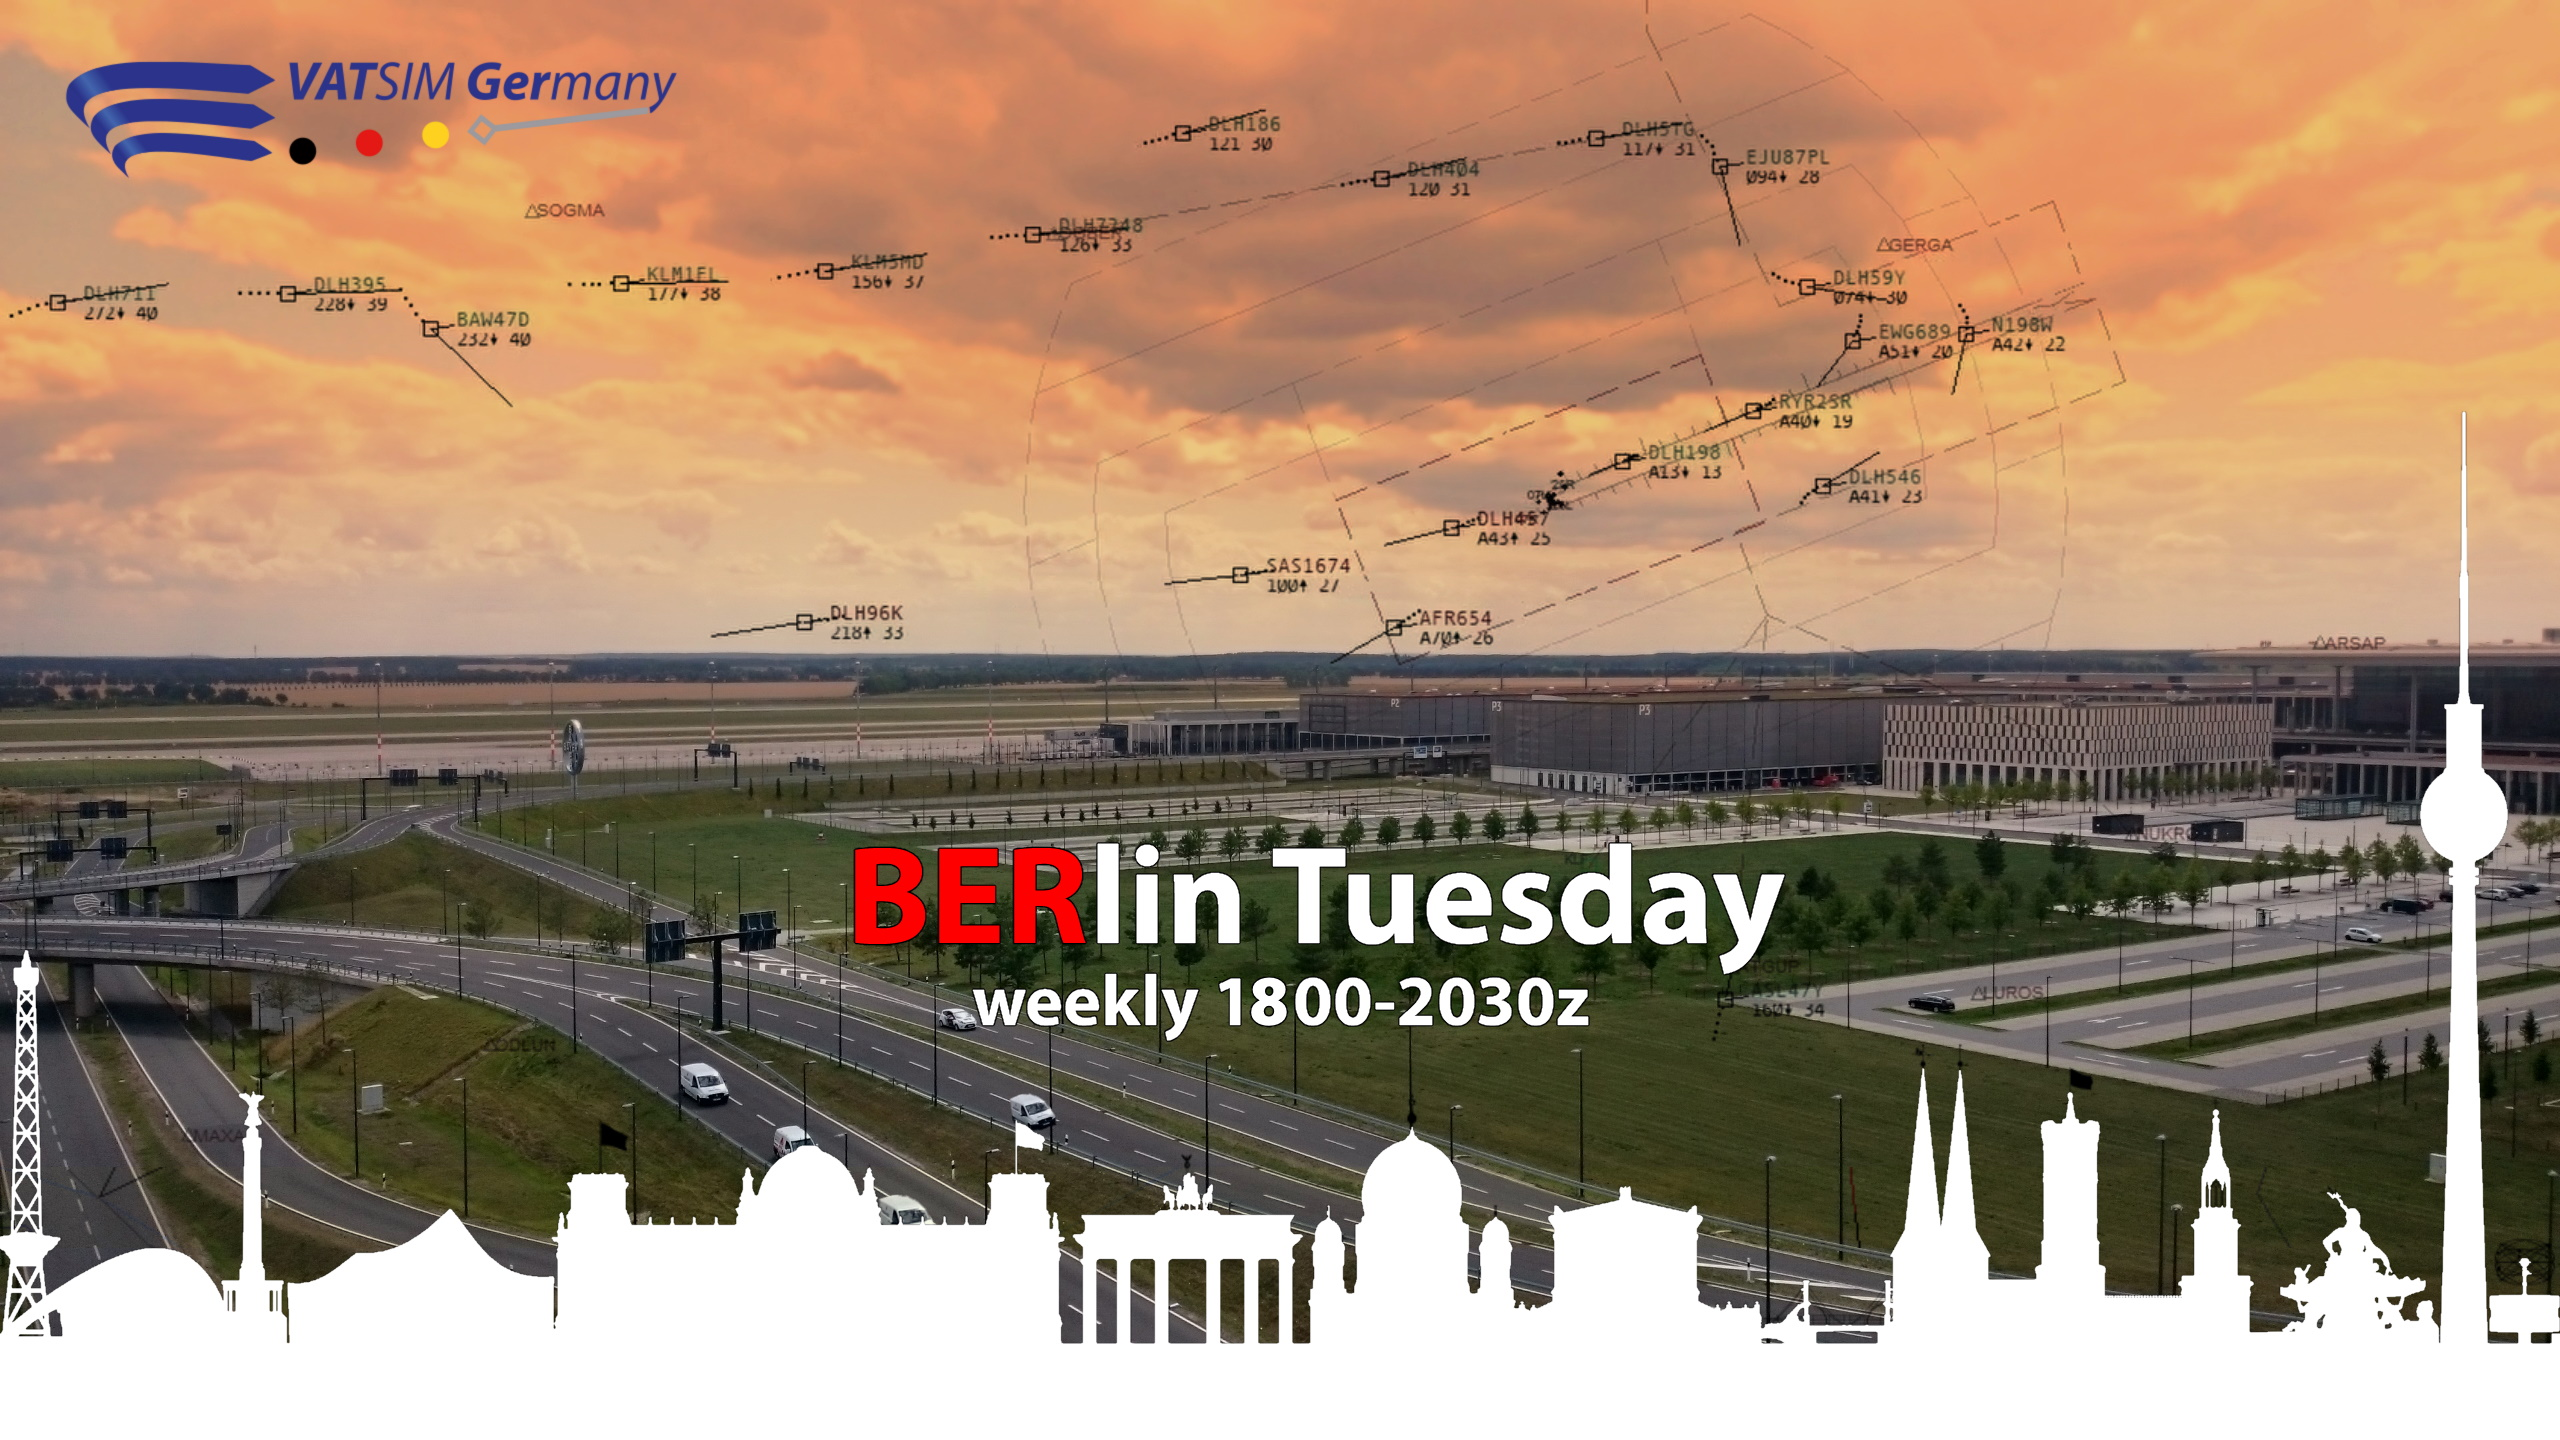 BERlin Tuesday - EDDB - Virtual Norwegian Events